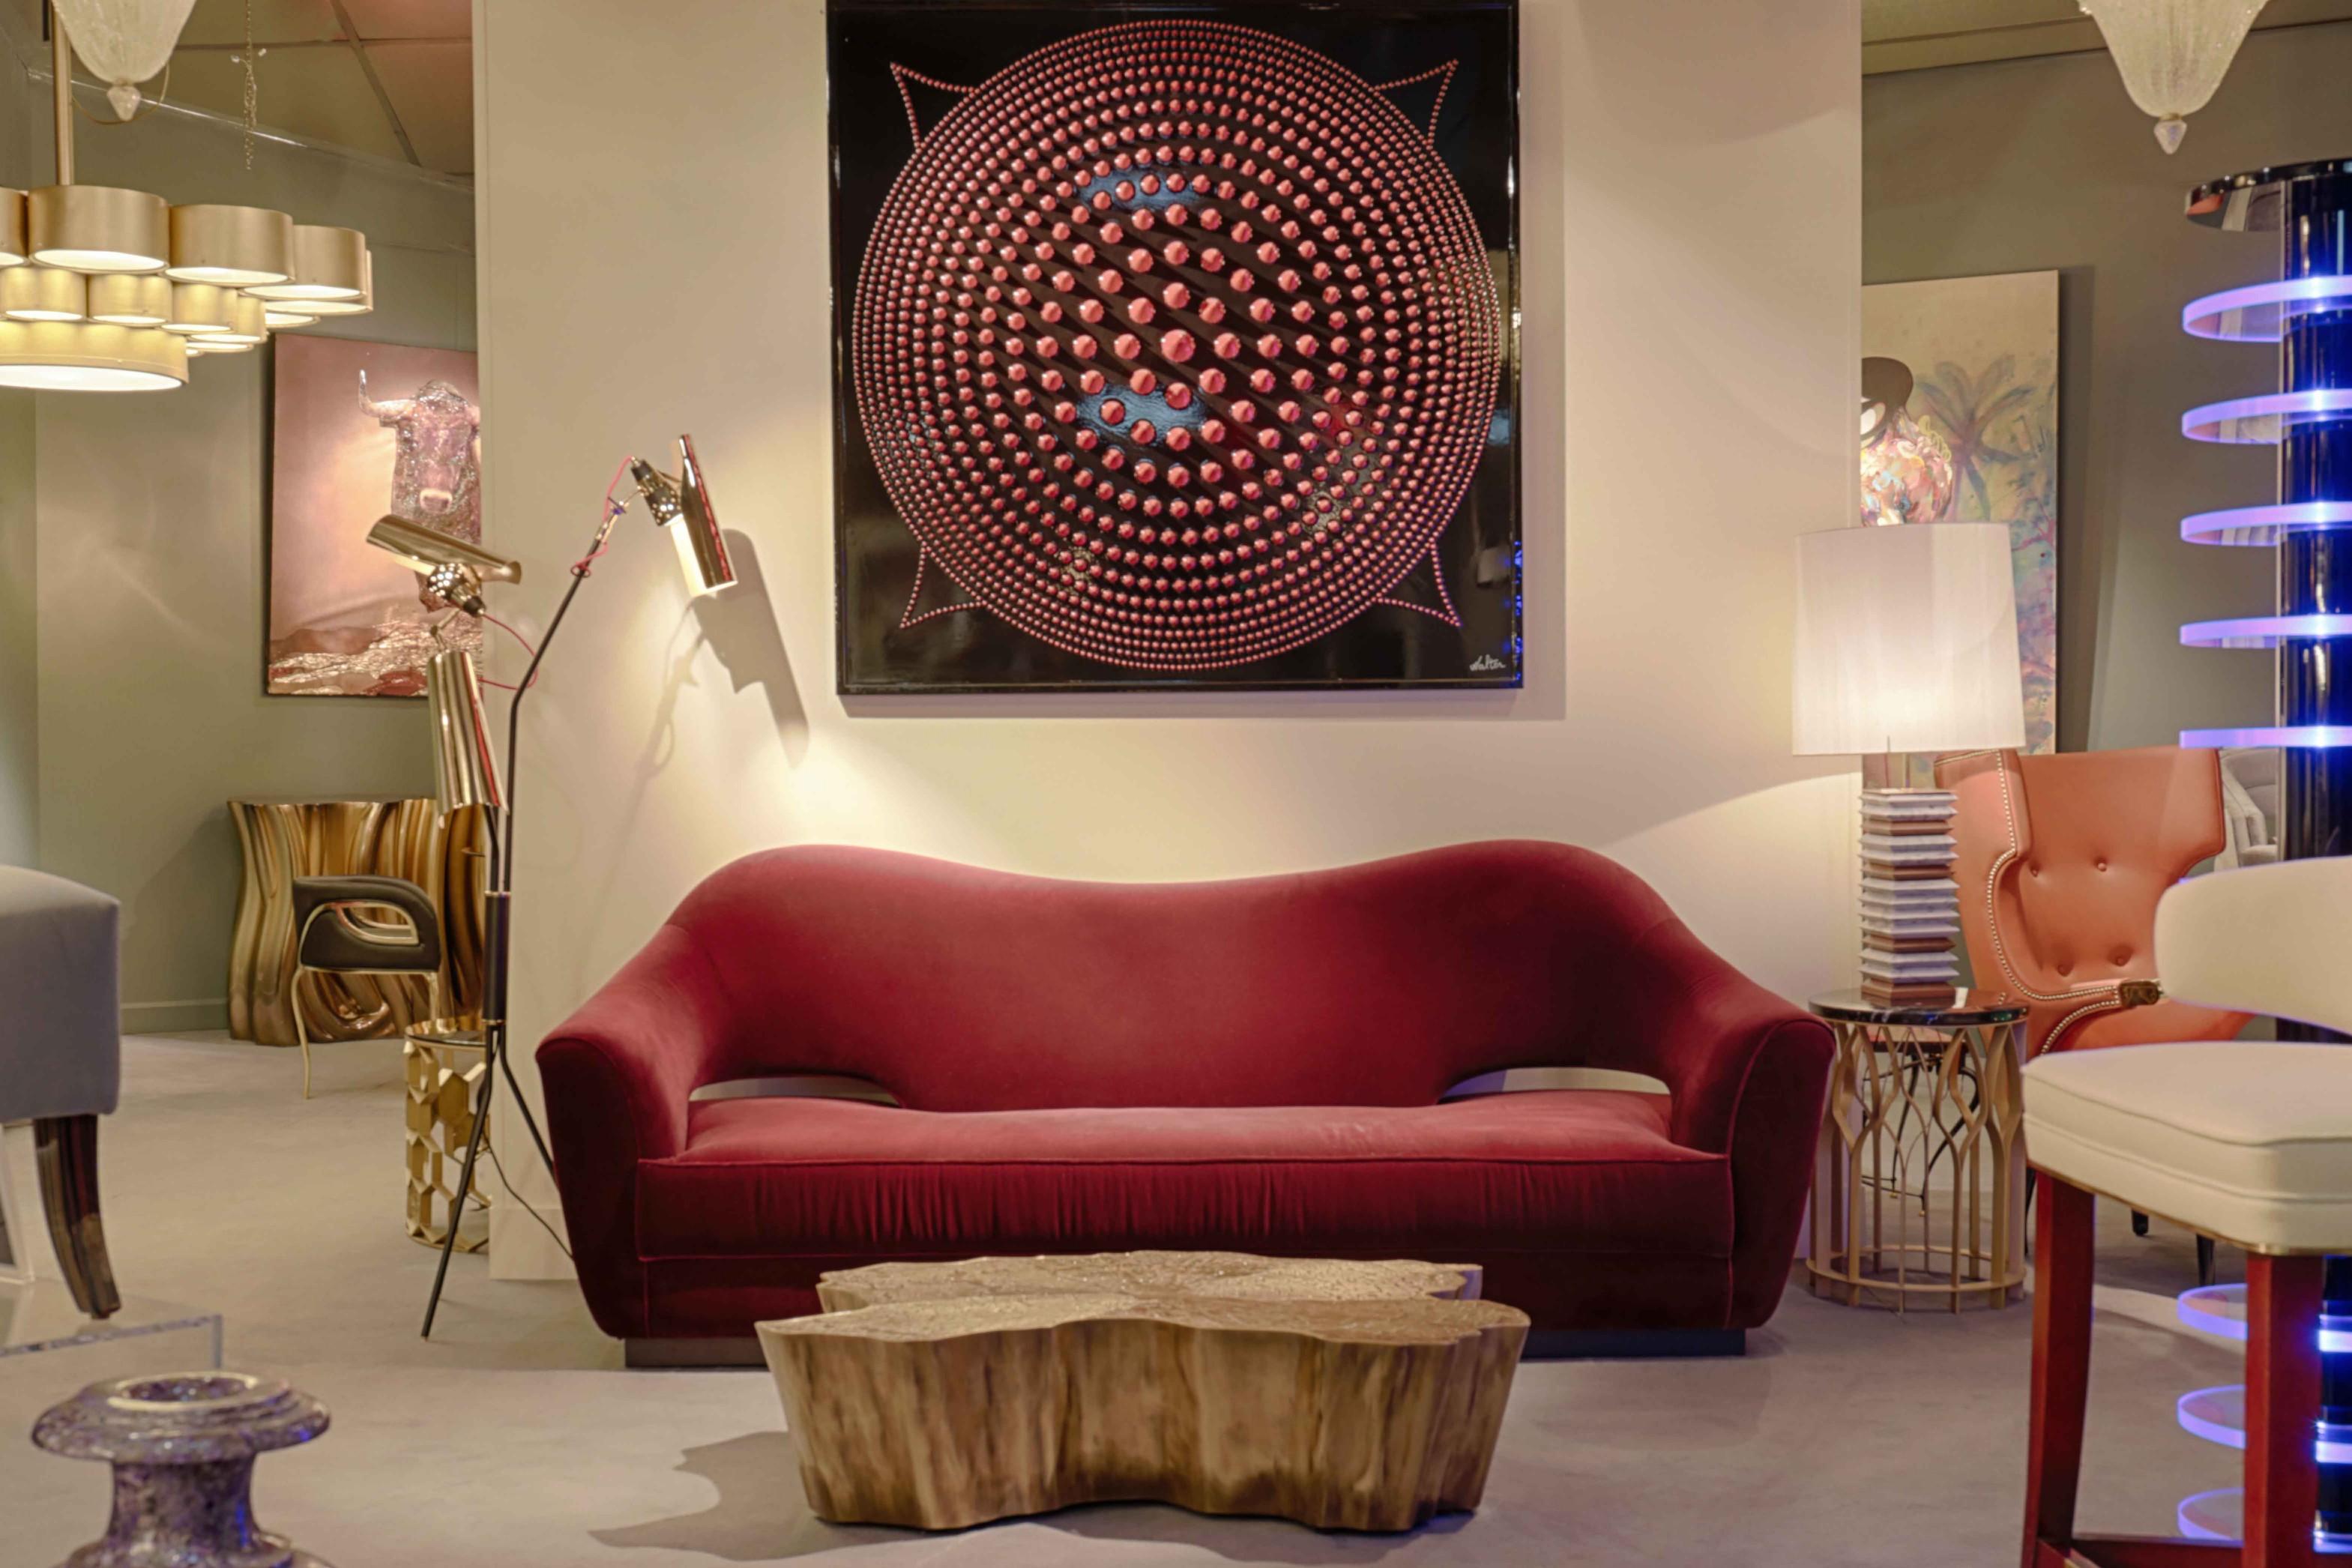 Furniture Tienda De Muebles En Barcelona Boca Do Lobo S  # Muebles Touch Design